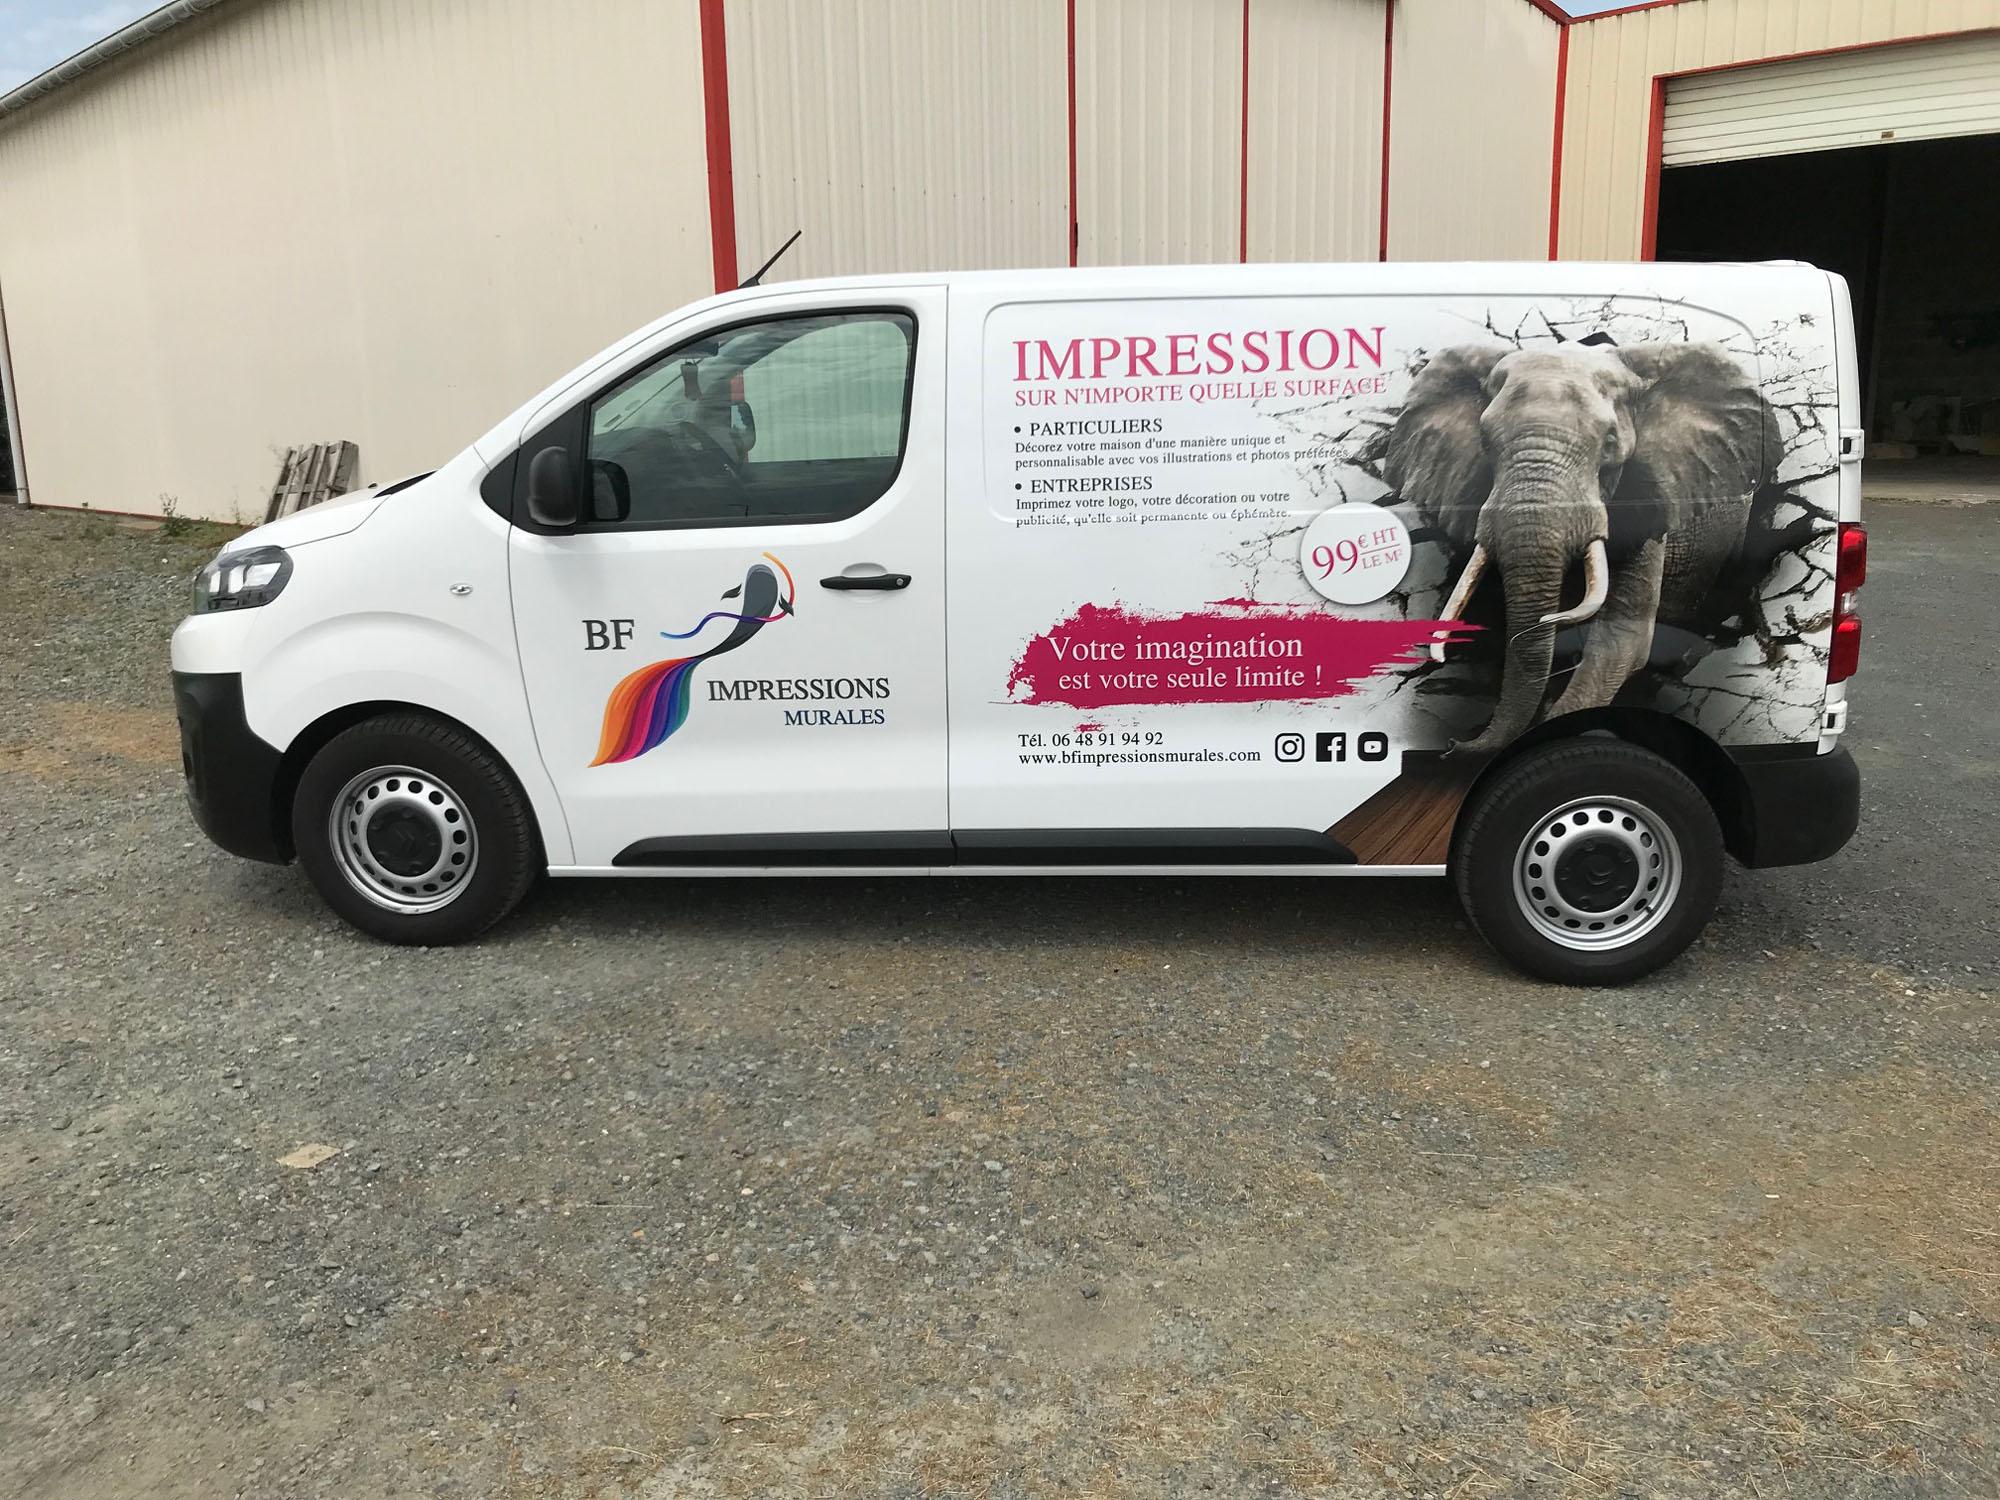 Marquage vehicule BF Impressions Murales - Guyonnet Publicite Fontenay le Comte